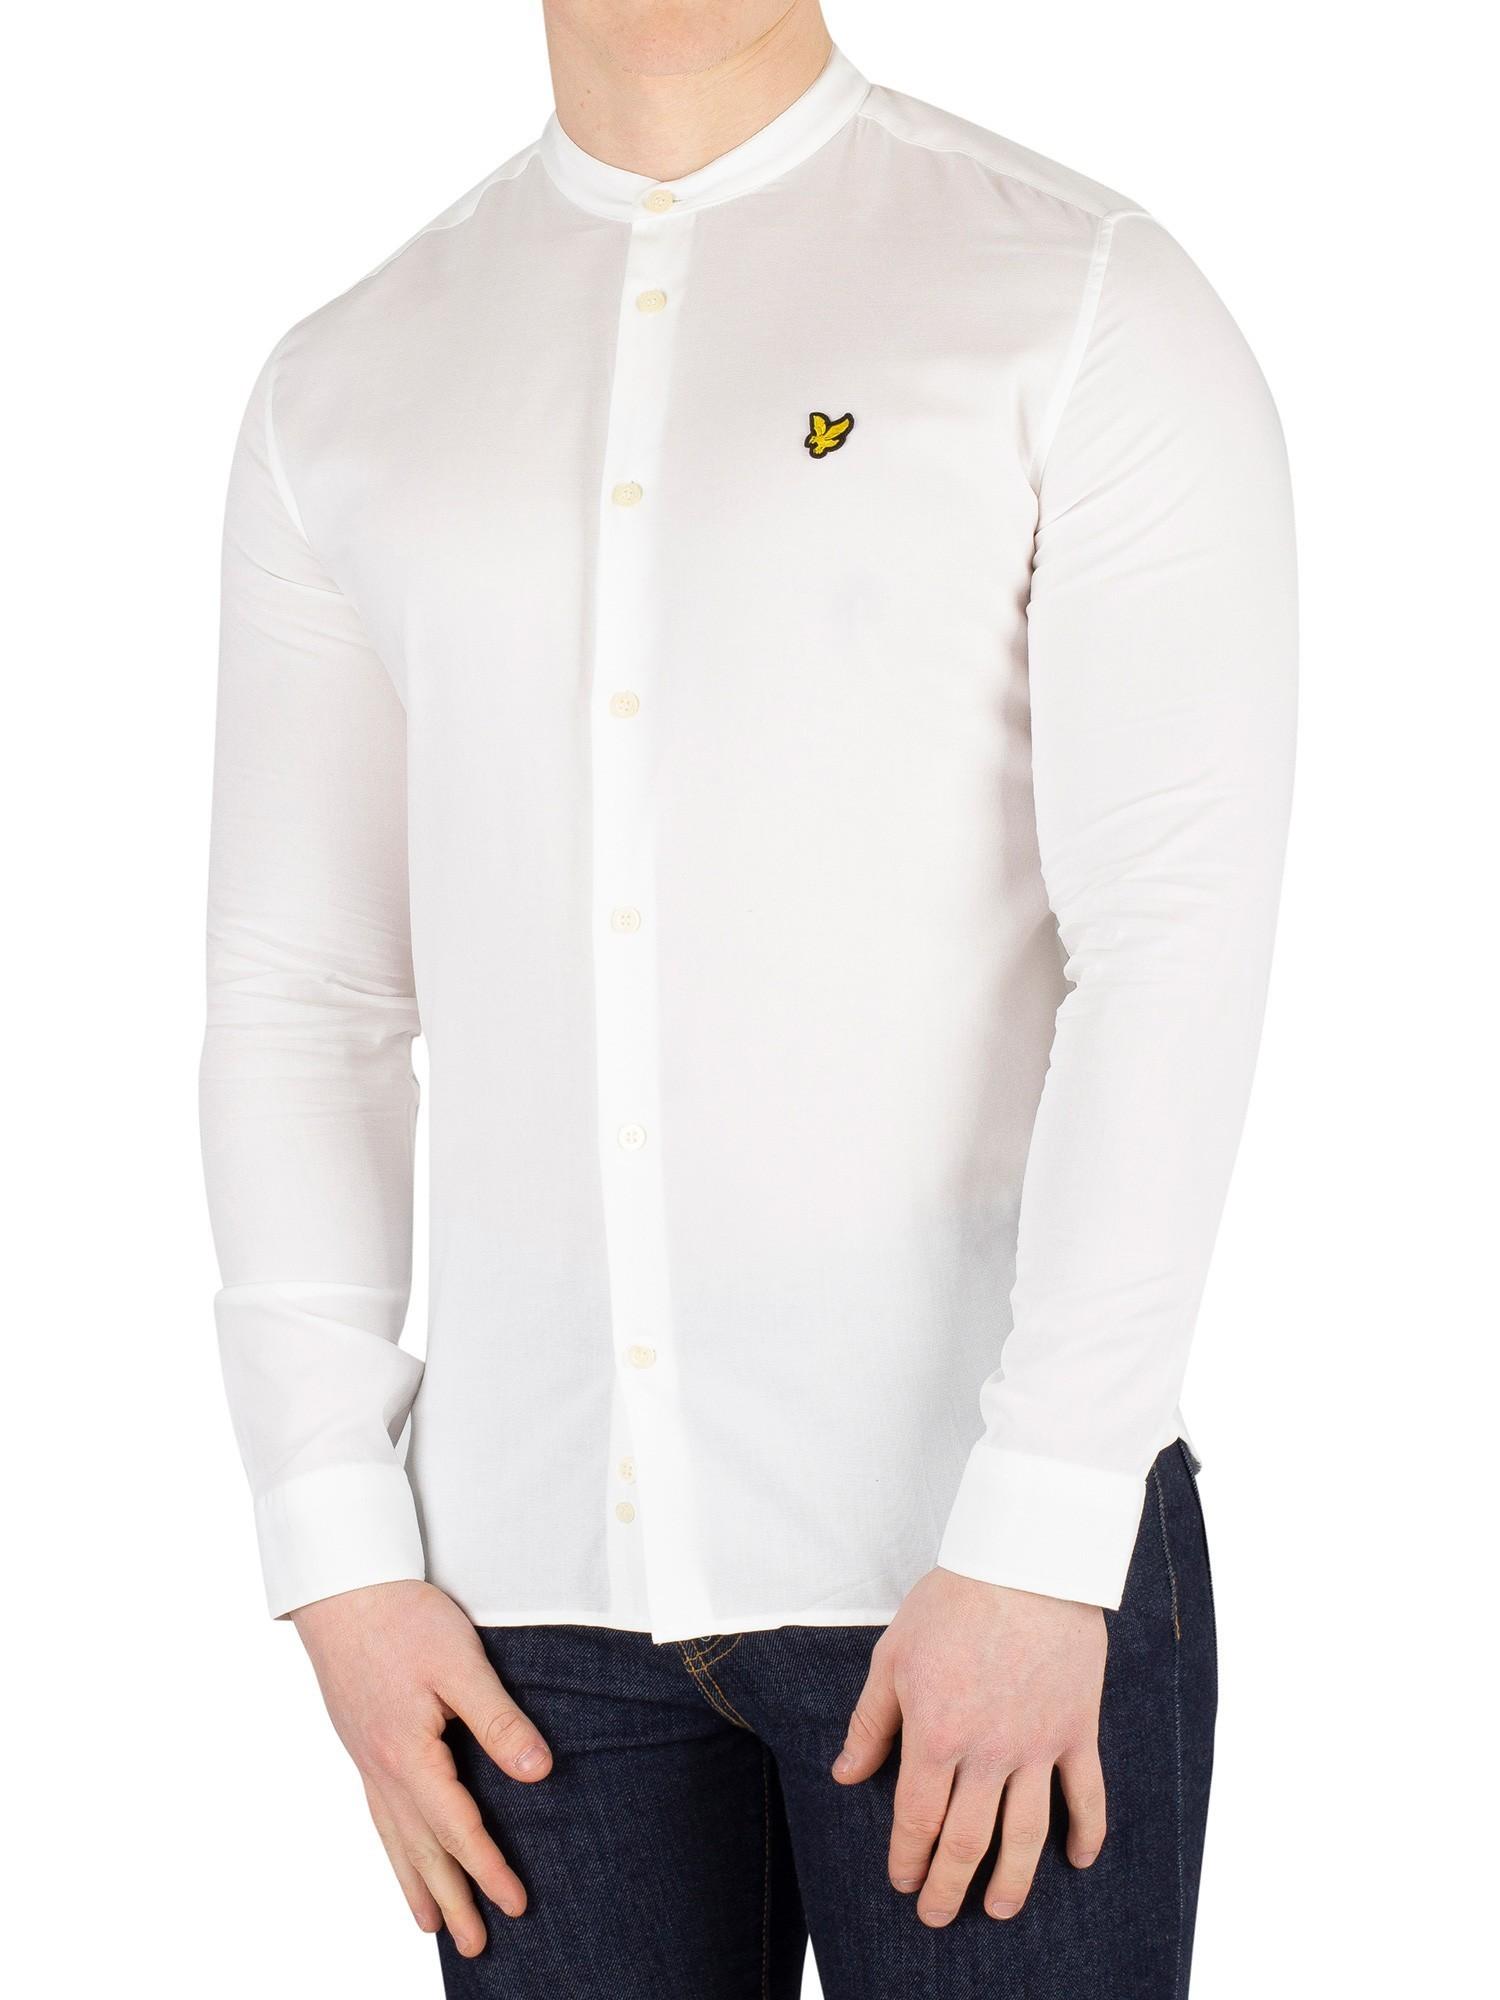 6a09dbeb Men's Shirts | Men's Designer Shirts | Standout